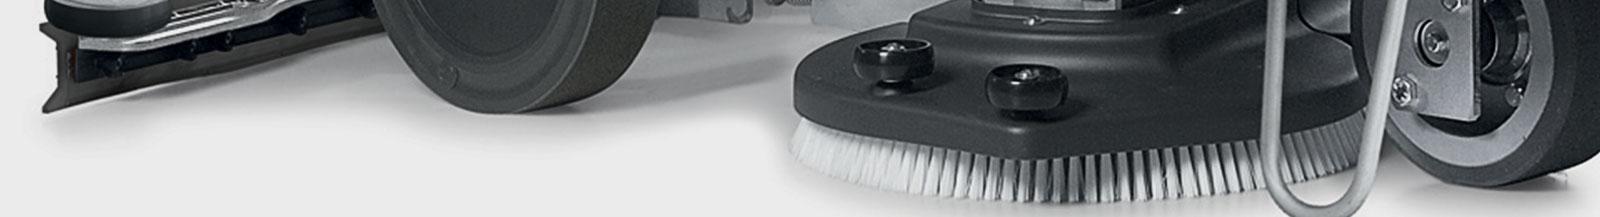 Masini curatenie pentru toate suprafetele